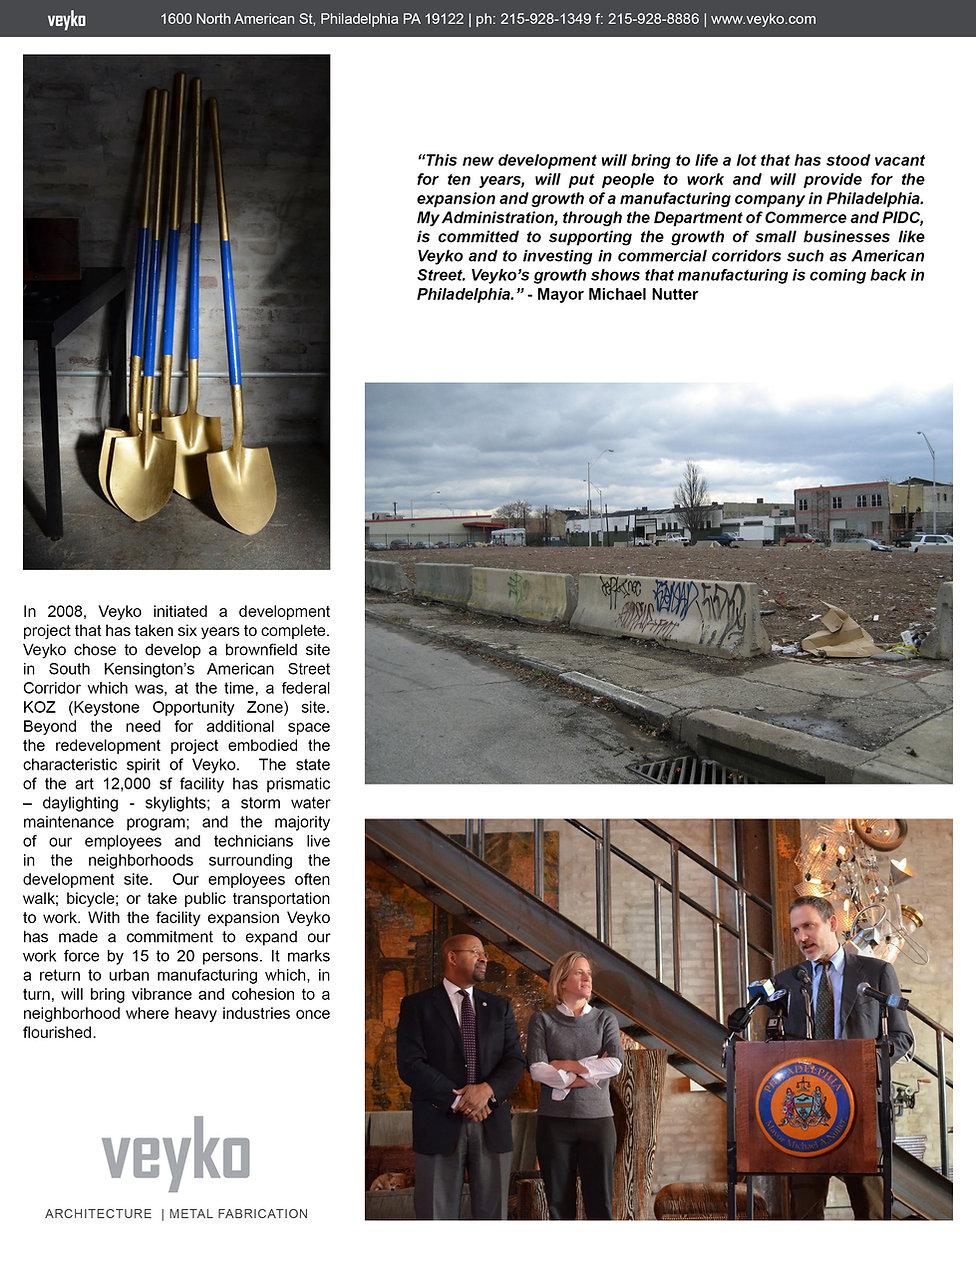 Issue 11 Veyko Building p2.jpg